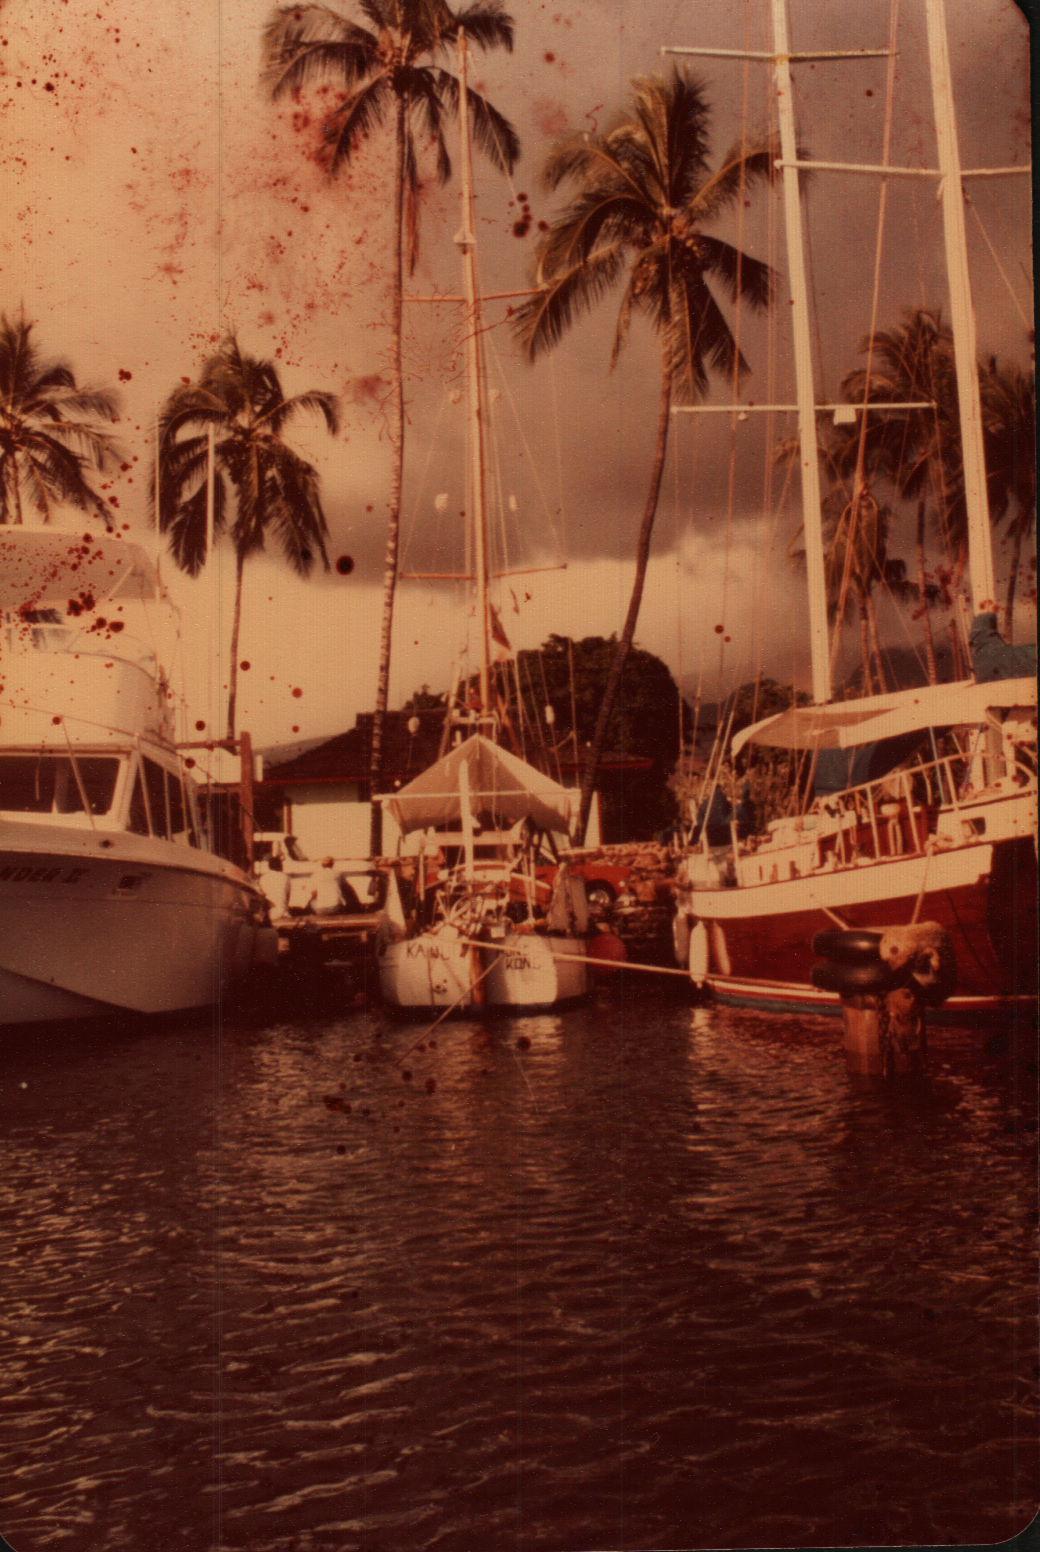 - Tied up in Lahaina, Maui